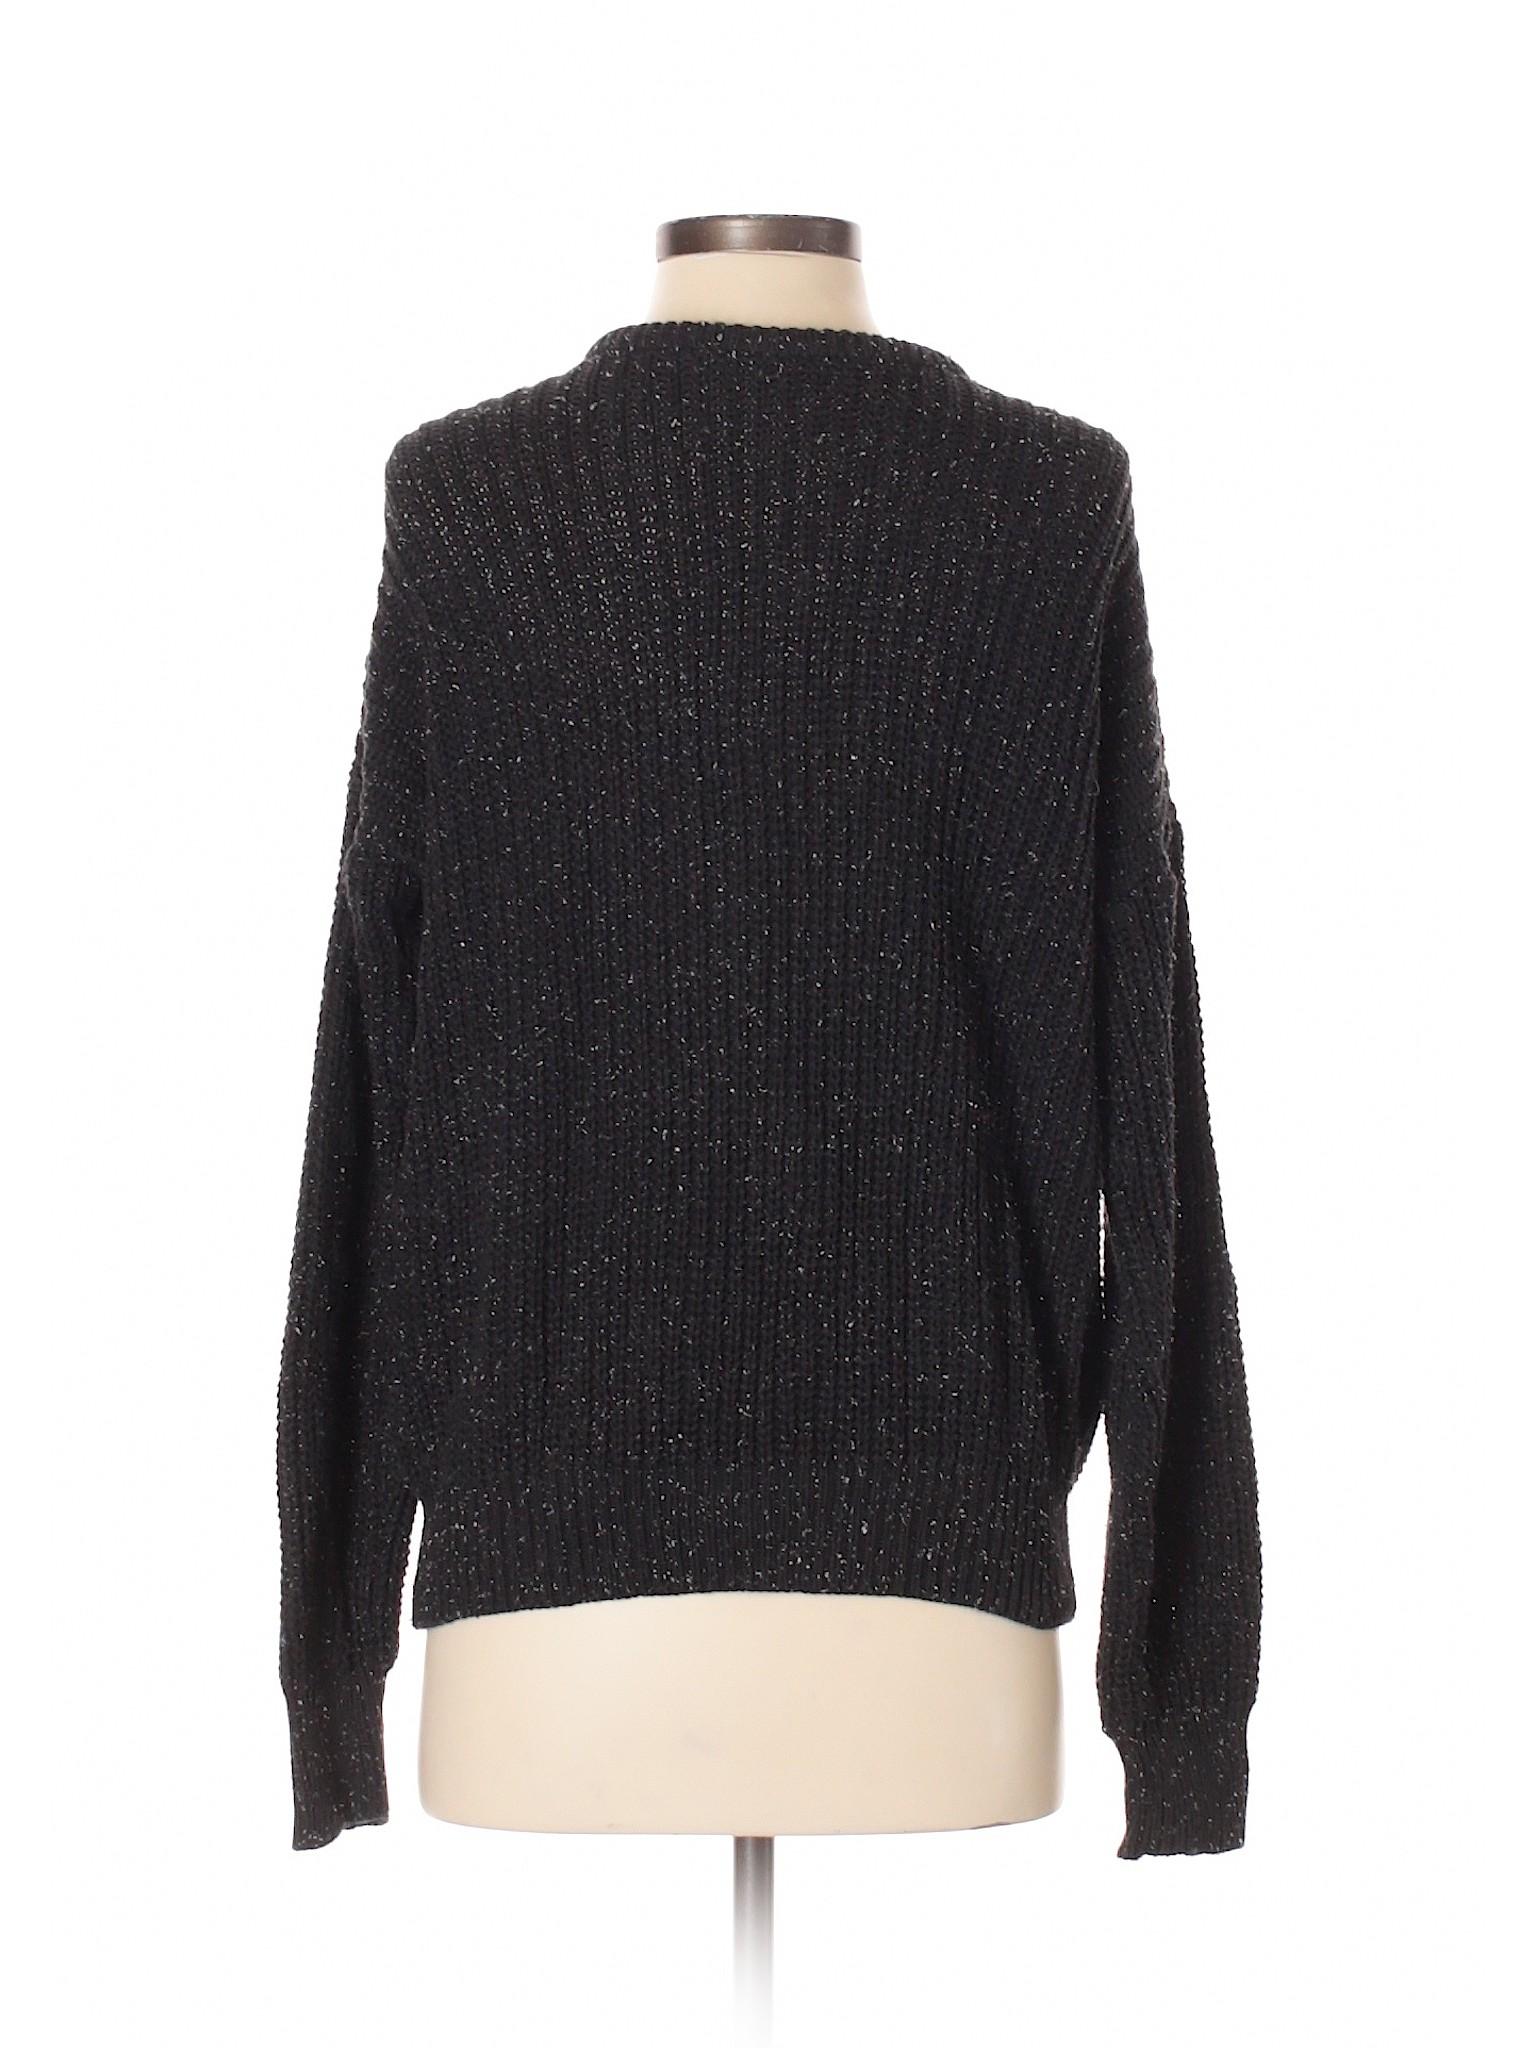 Sweater winter Pullover American Boutique Apparel vxfqH